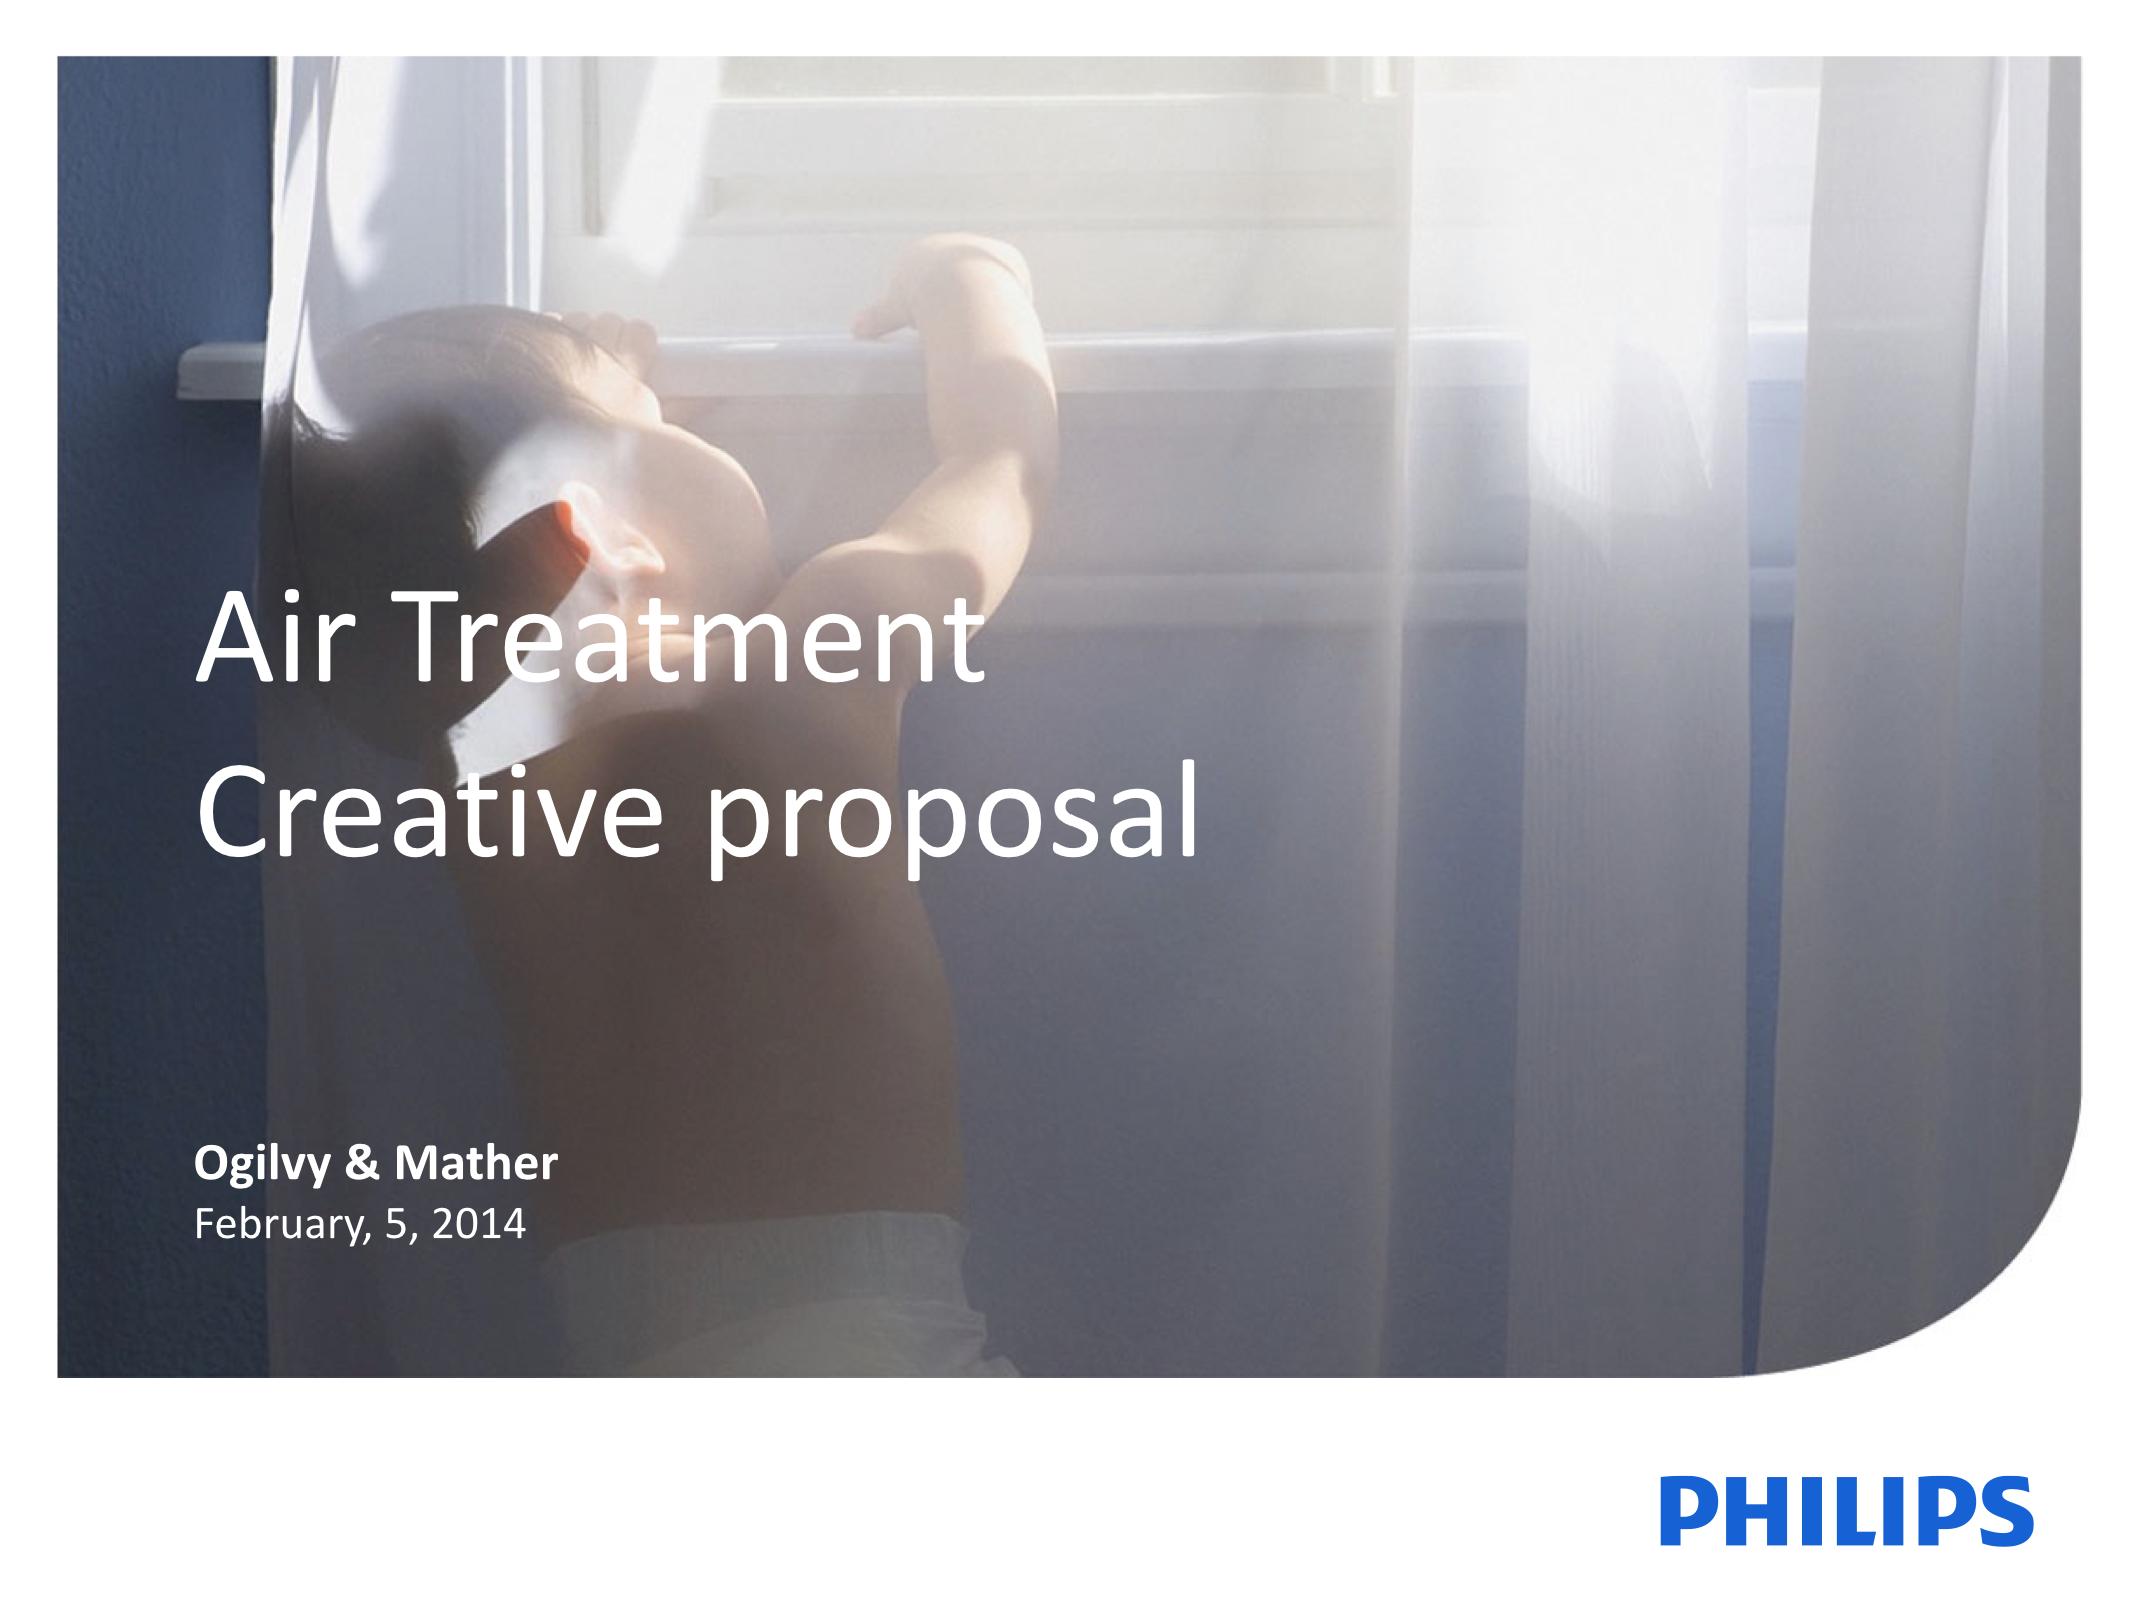 Philips Air Treatment. Creative proposal.